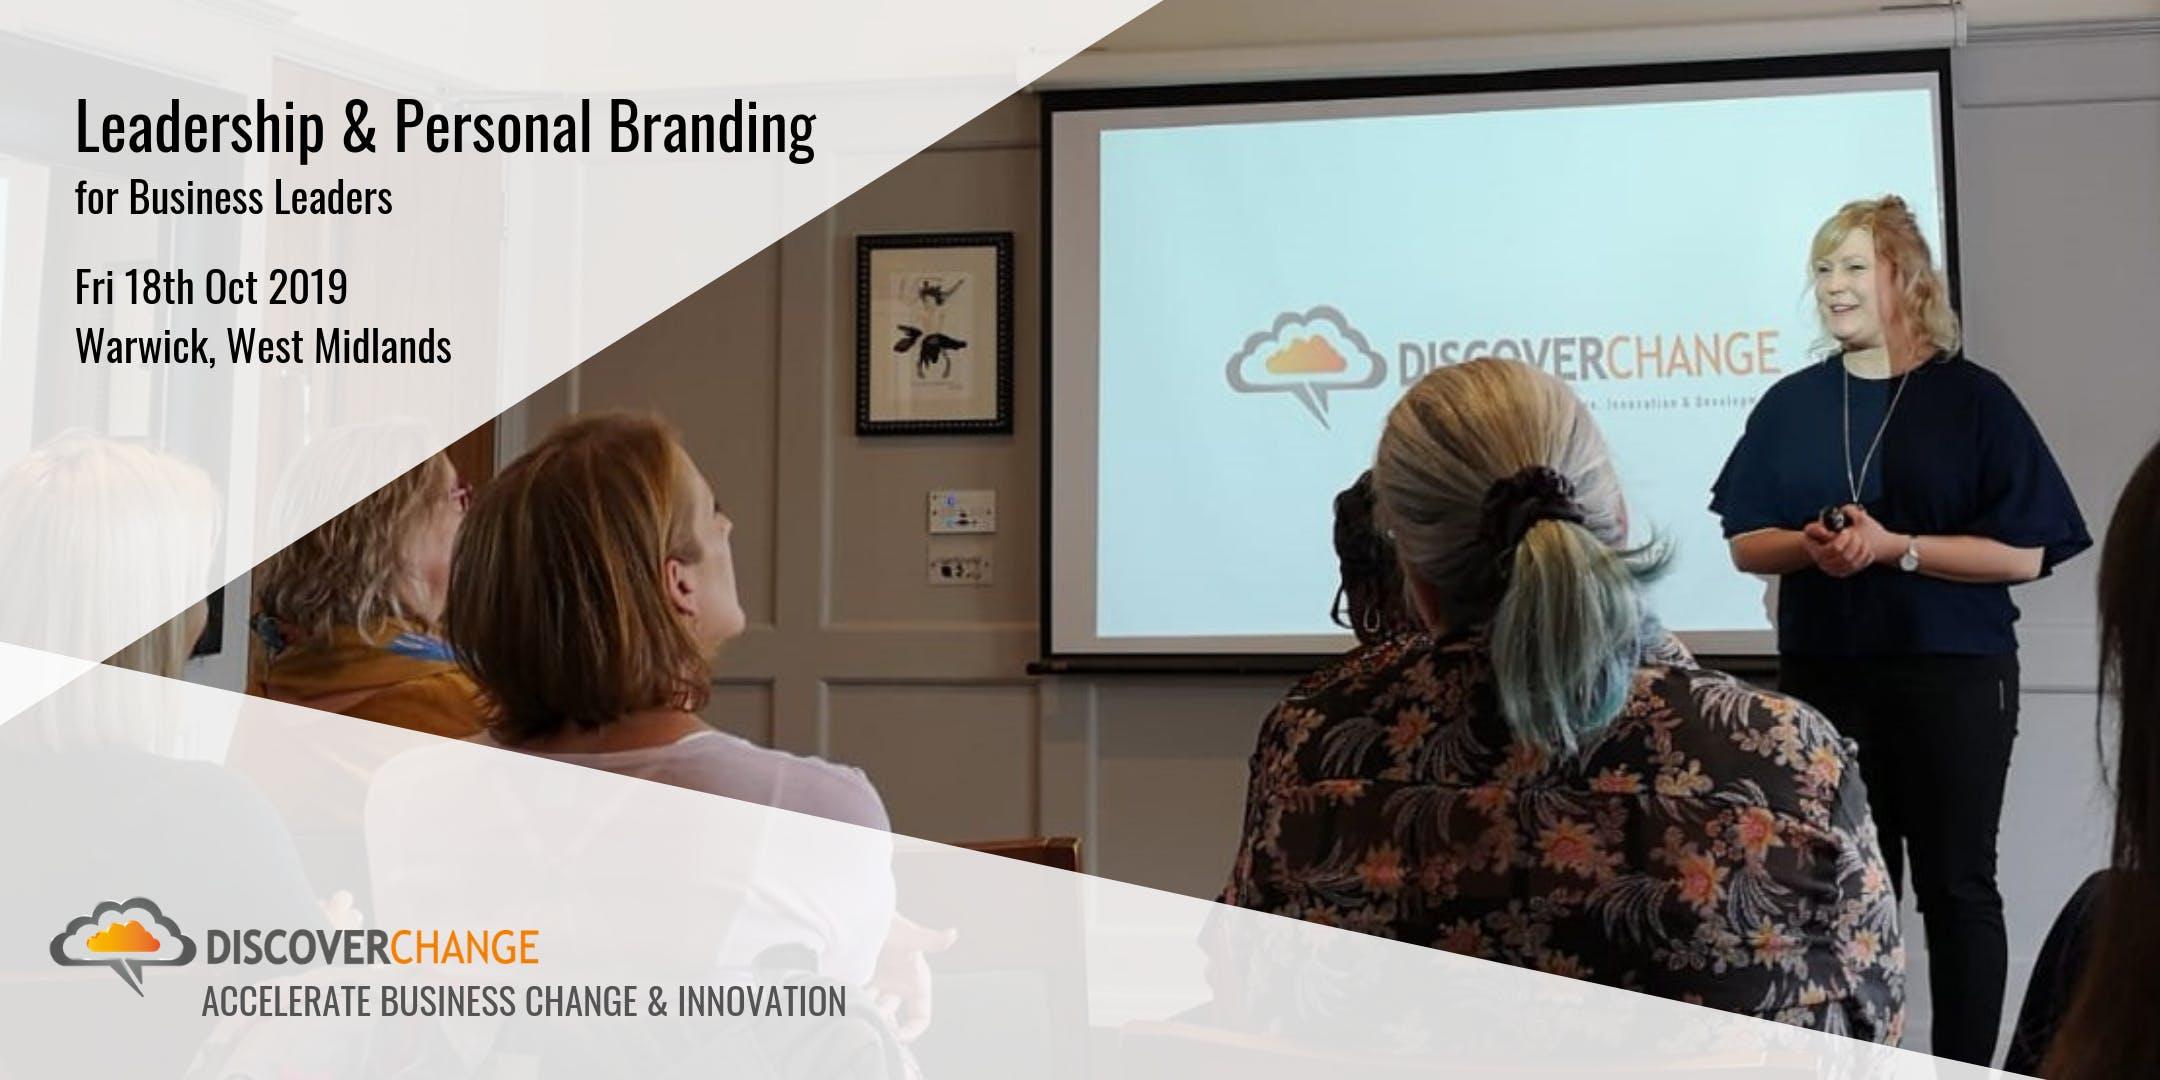 Leadership & Personal Branding for Business Leaders